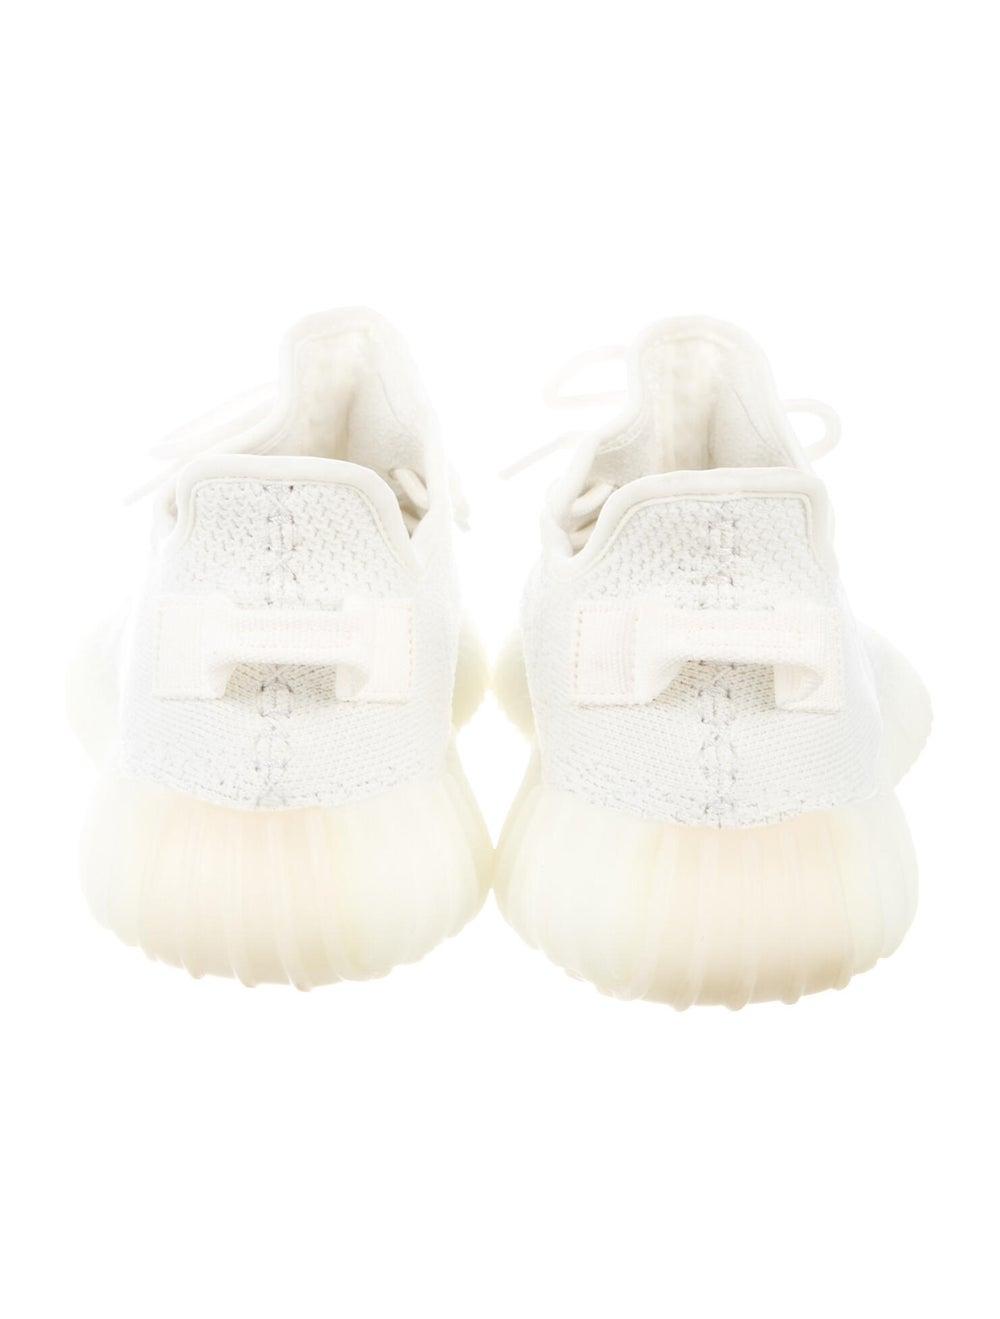 Yeezy x adidas Boost 350 V2 Cream Sneakers Sneake… - image 4